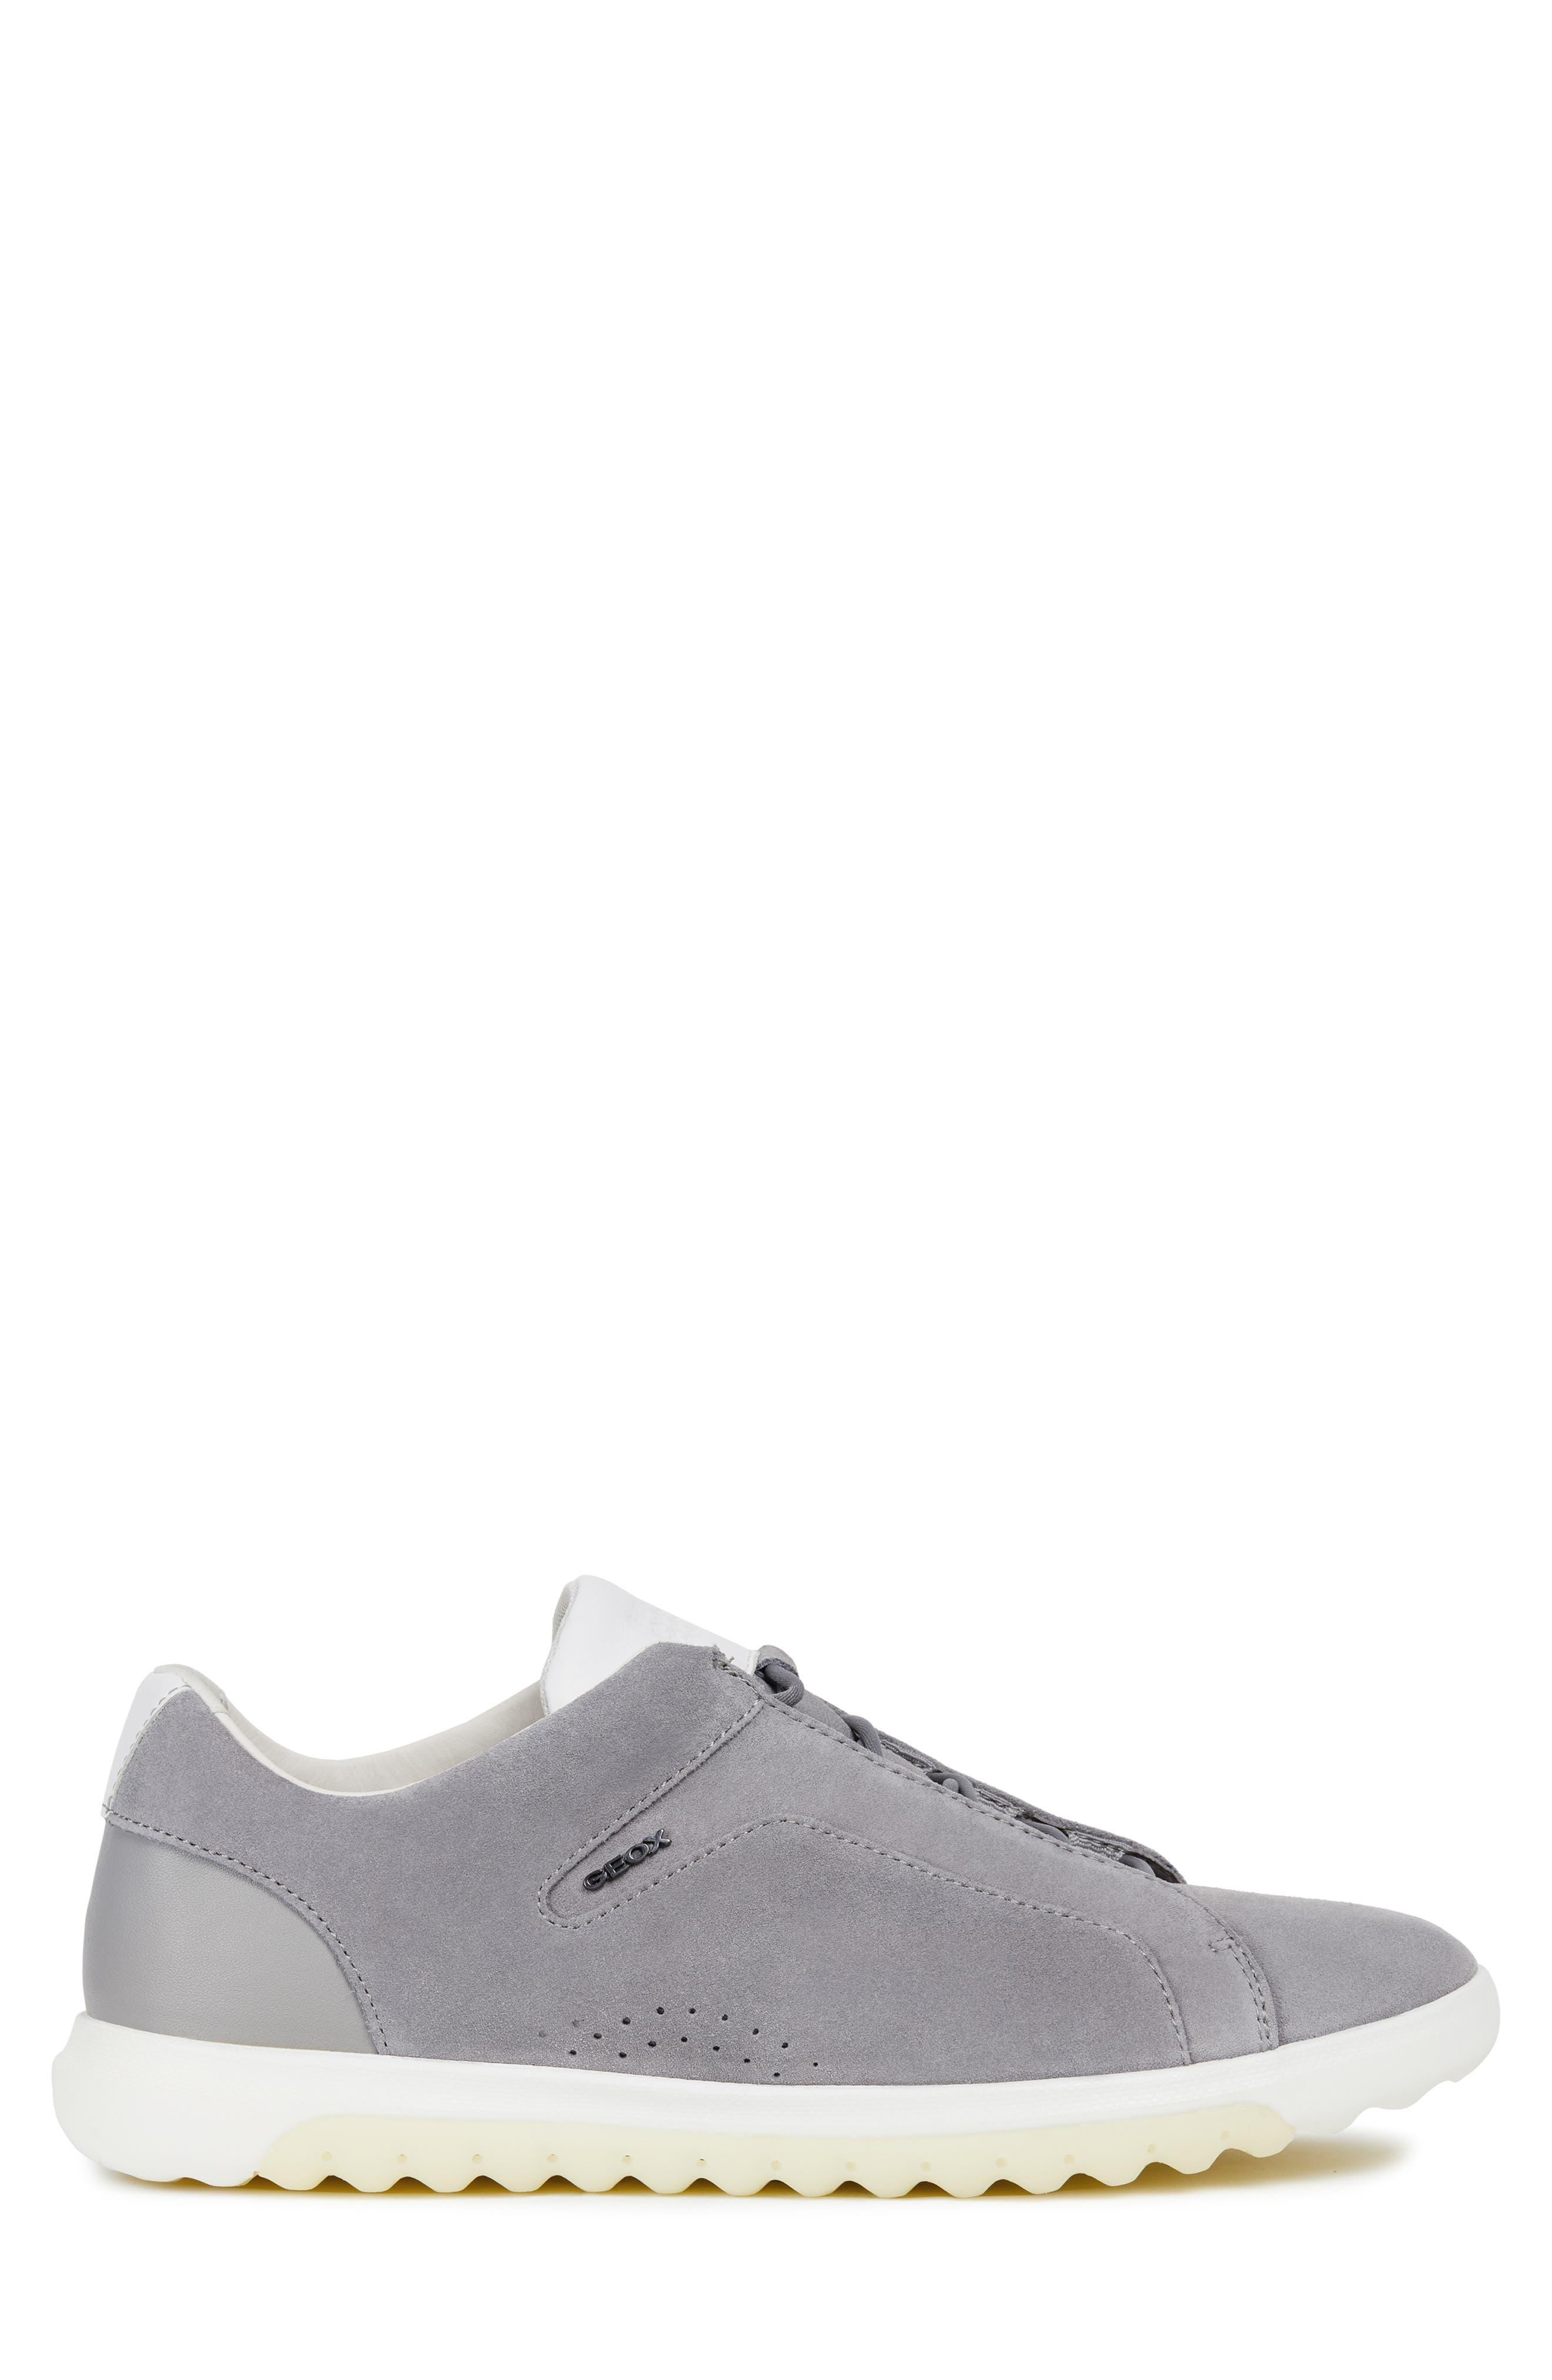 Nexside 1 Sneaker,                             Alternate thumbnail 3, color,                             STONE